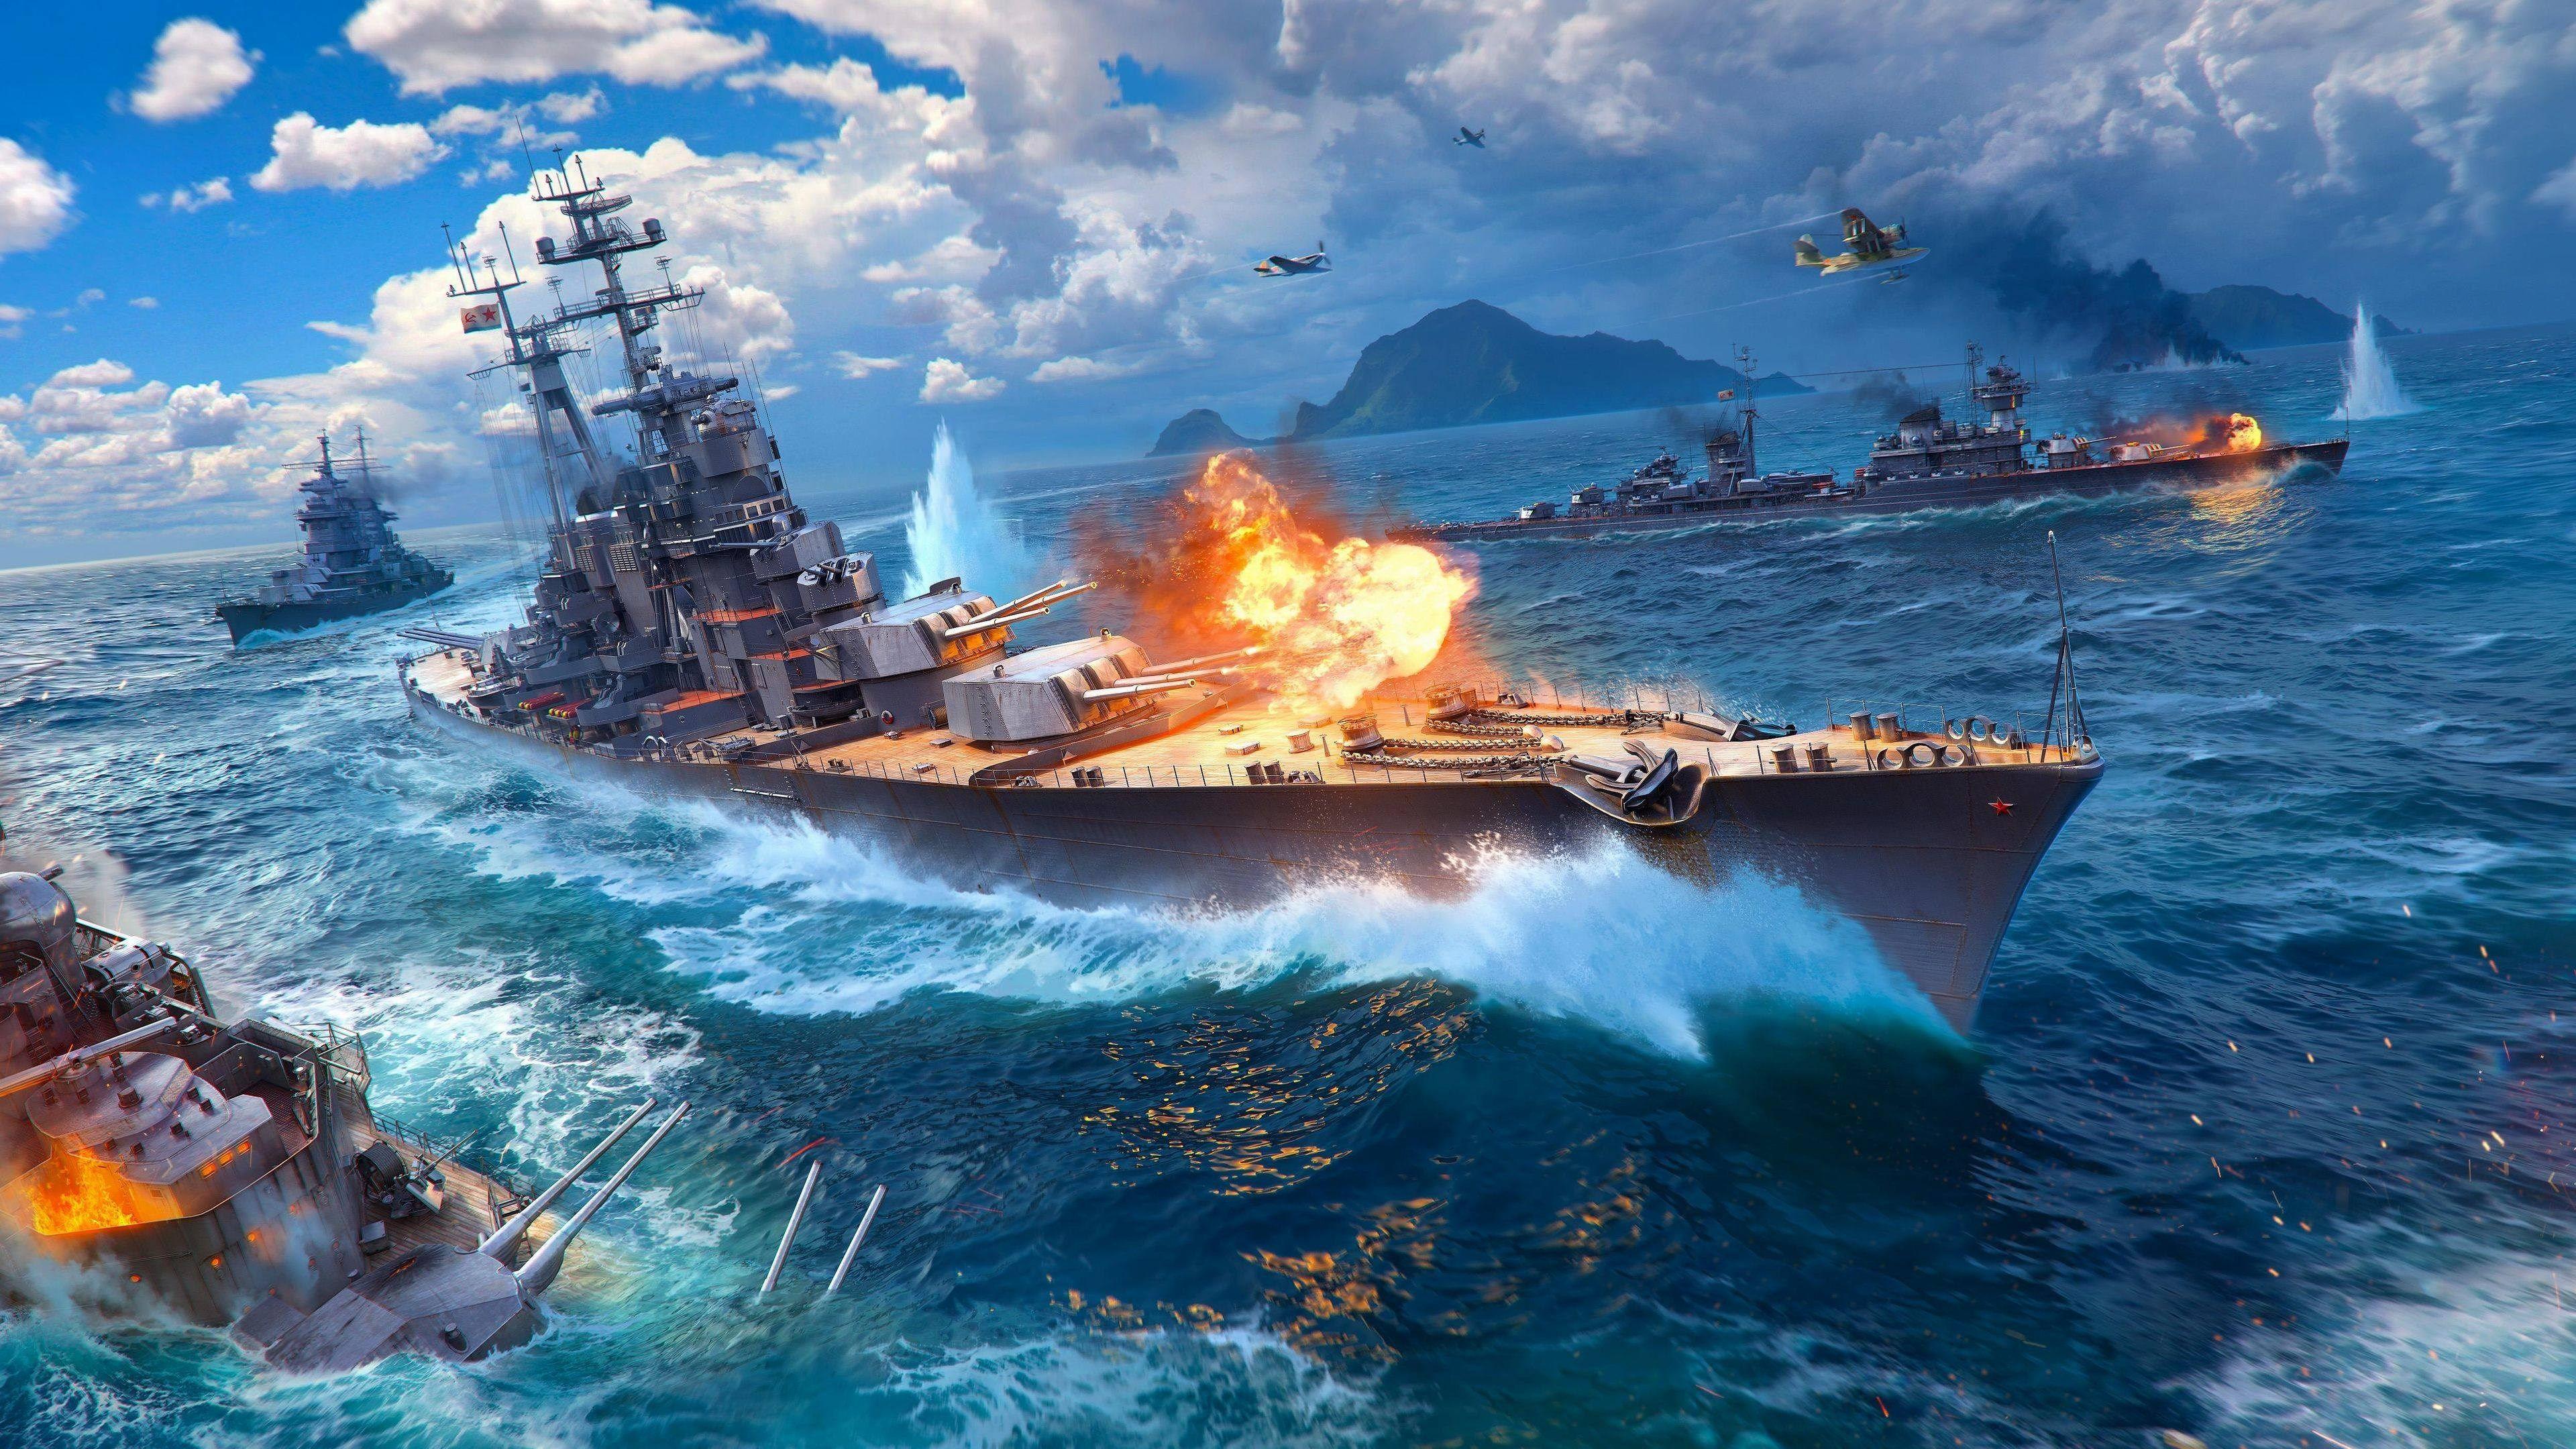 World Of Warship Game Wallpaper Free Download For Desktoptitlemeta Namedescription Contentworld Of Warship Ga World Of Warships Wallpaper Warship Games Warship